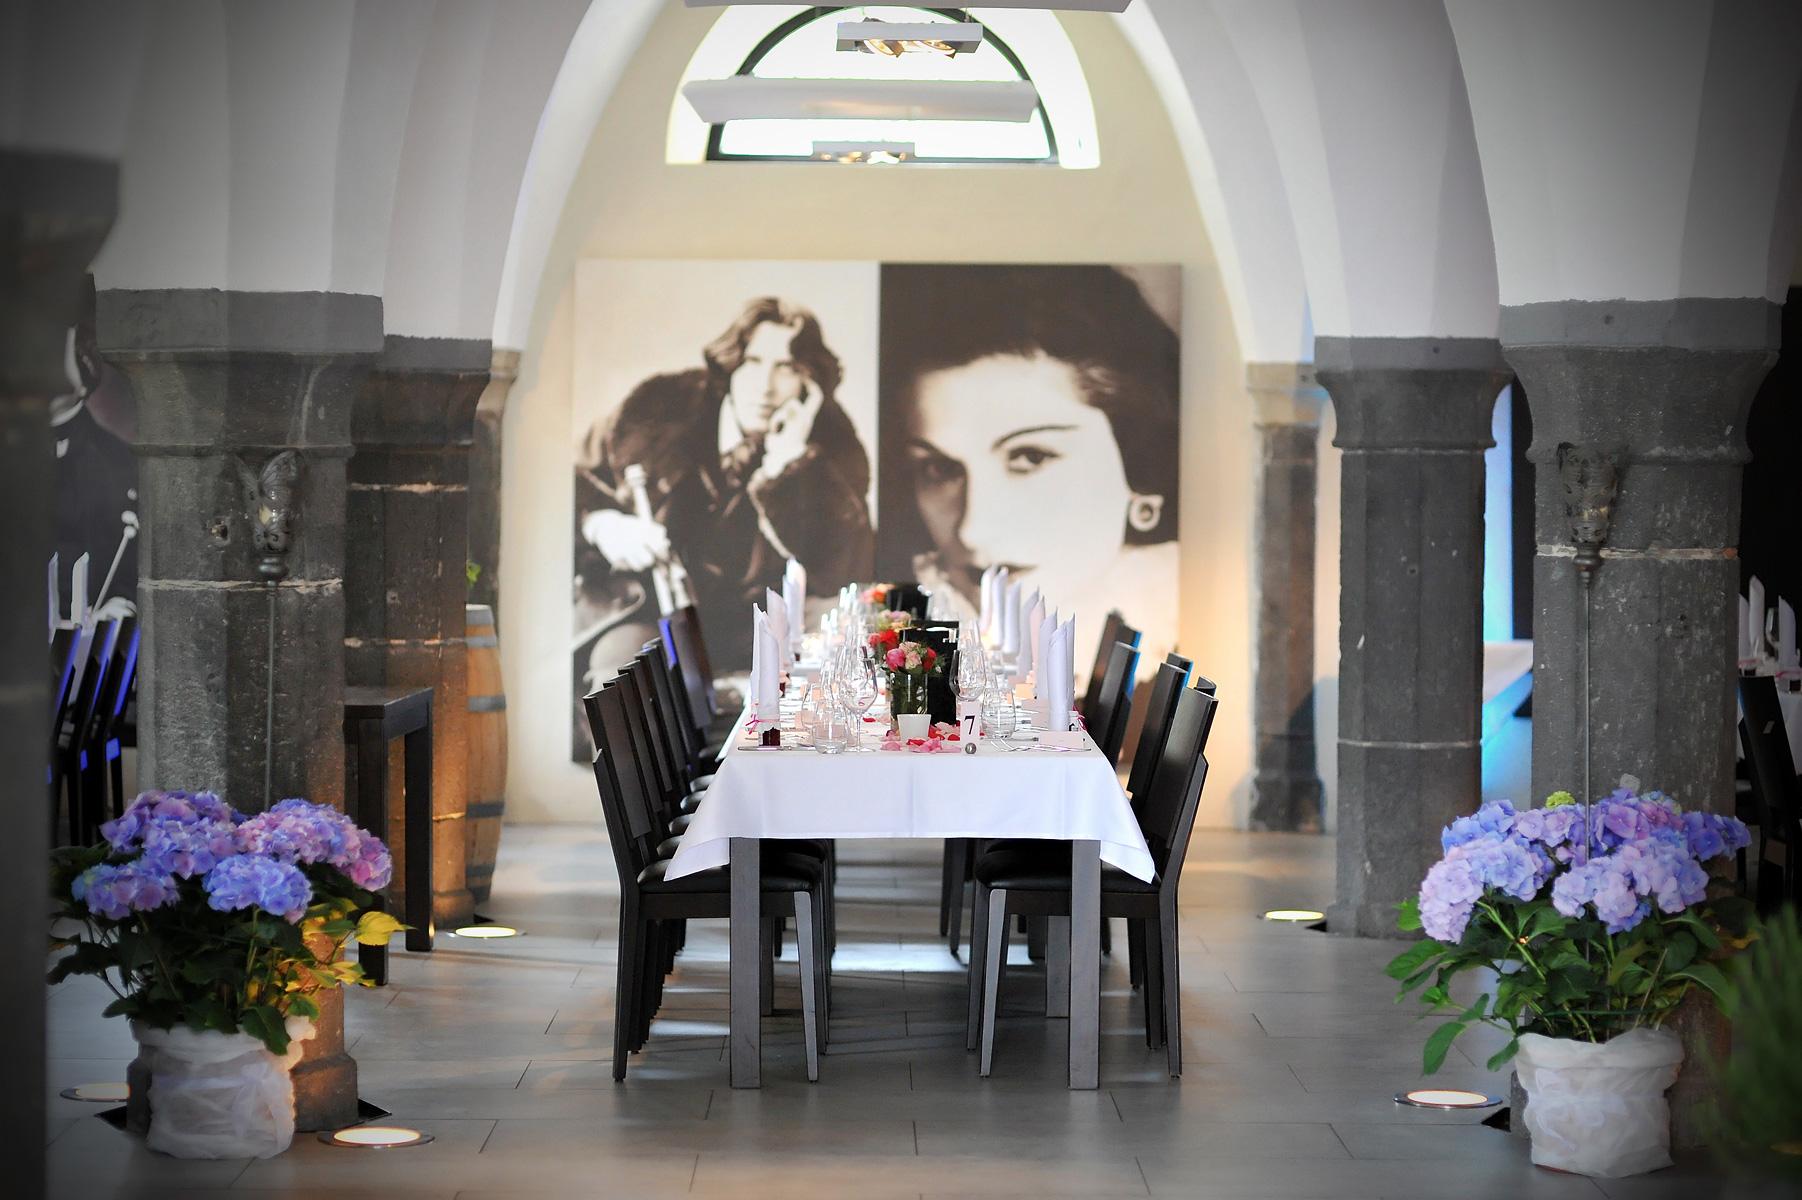 Hochzeitsfotografie-Gerhard's-Genusswerkstatt-Koblenz-Nicole-Bouillon-Fotografie